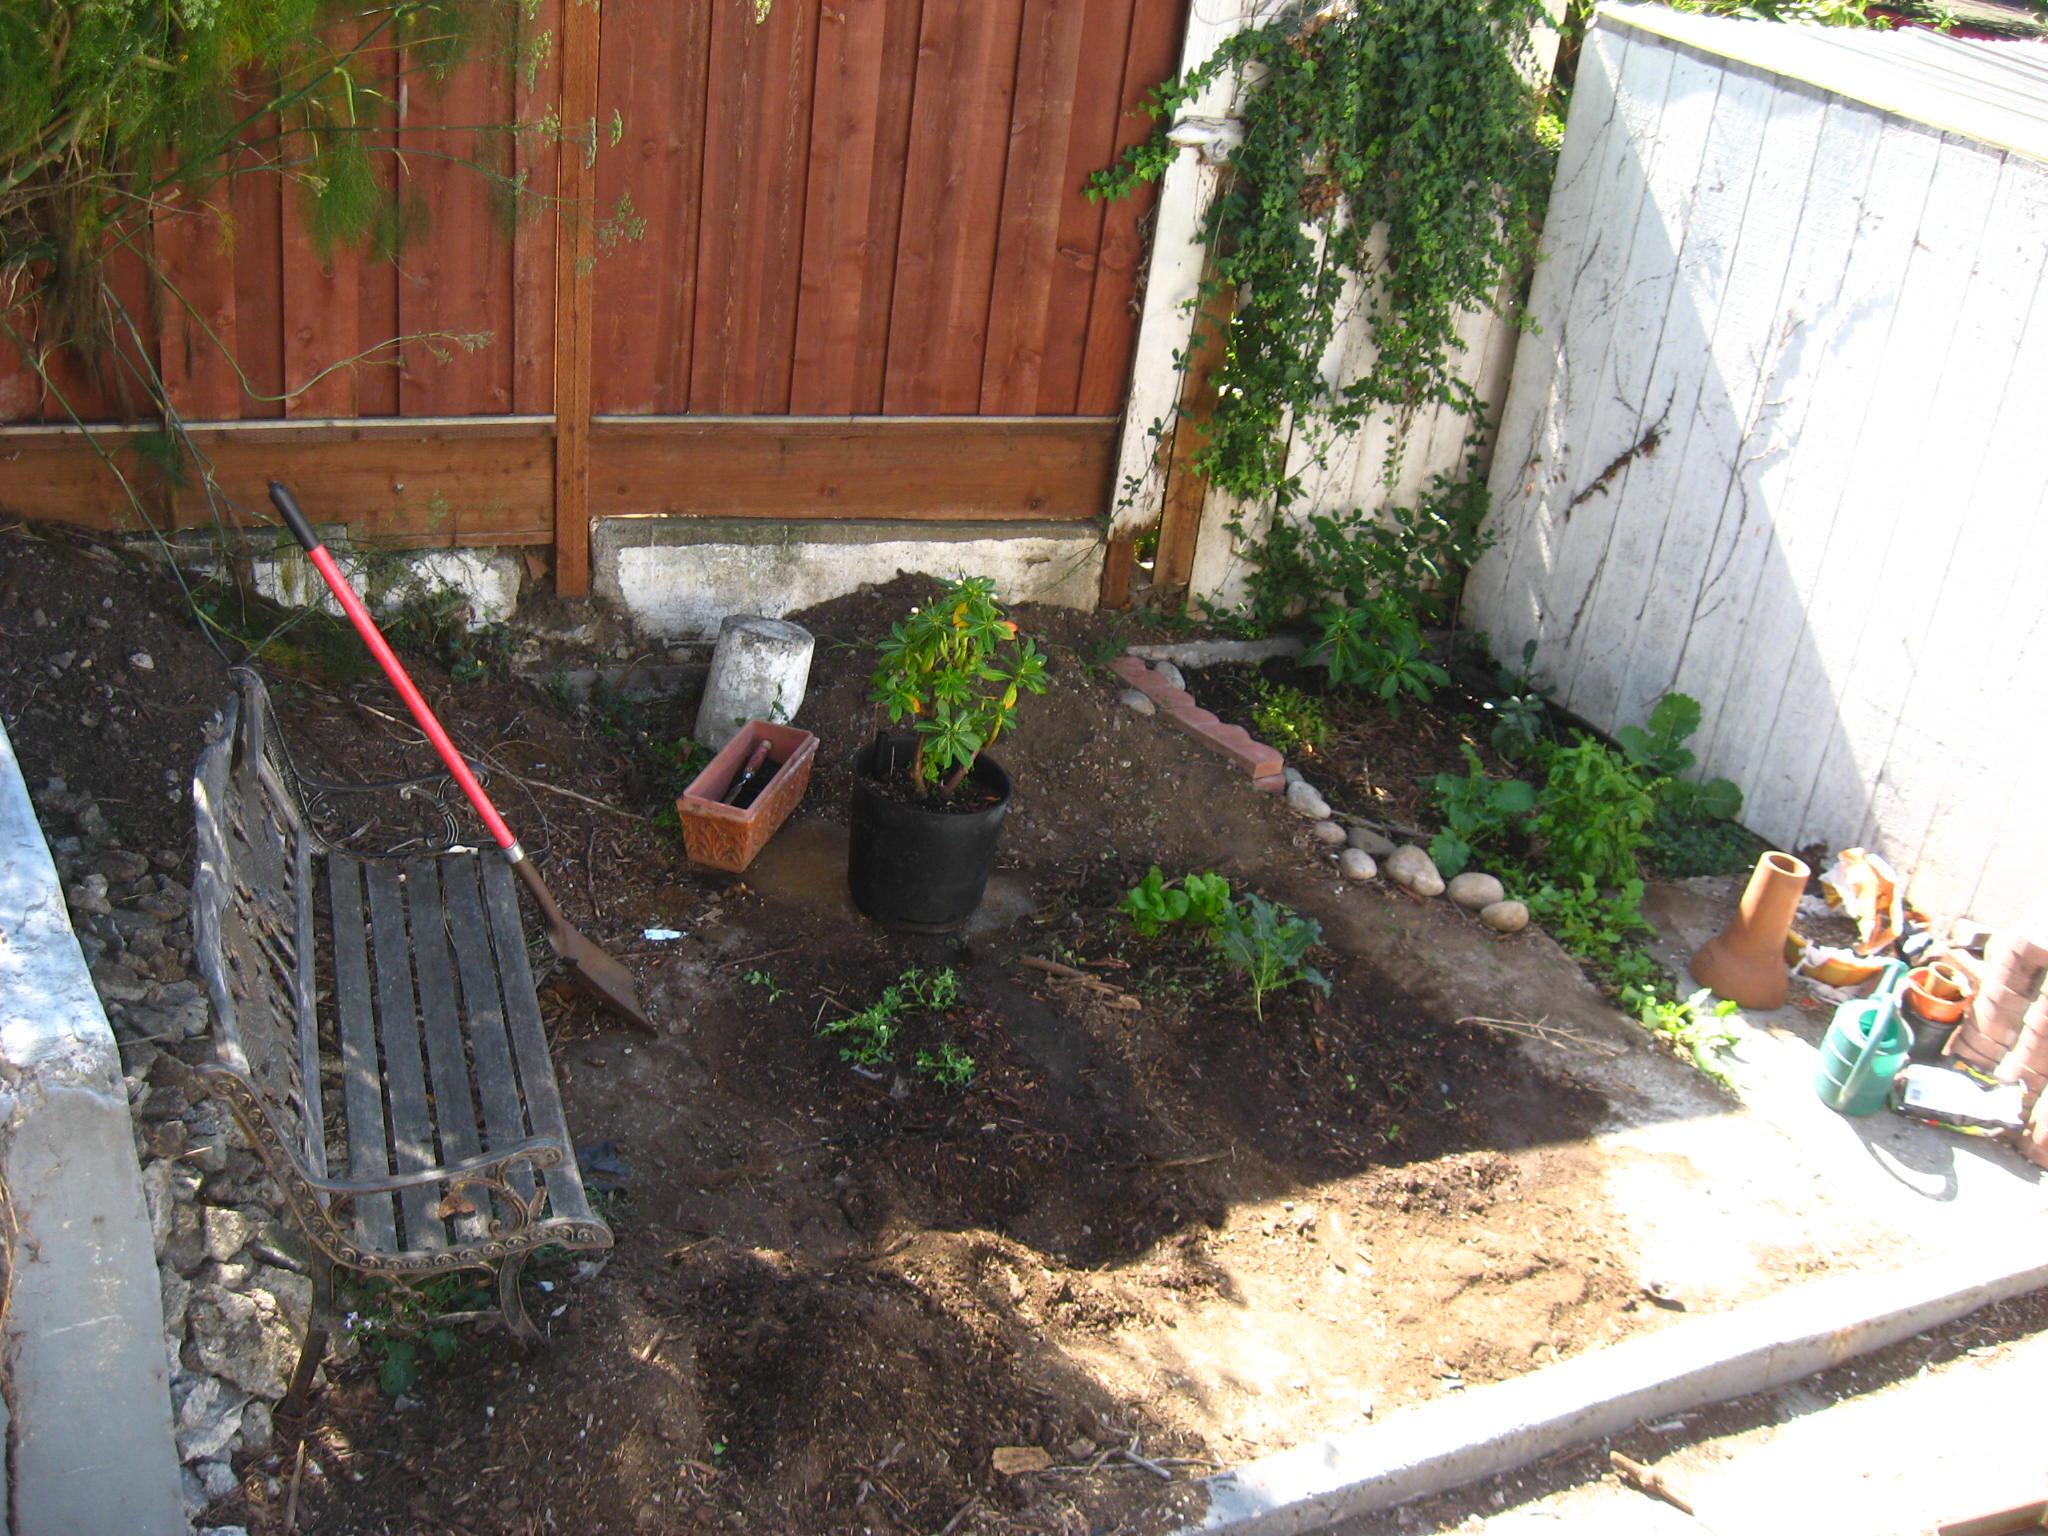 Primo Garden Area started